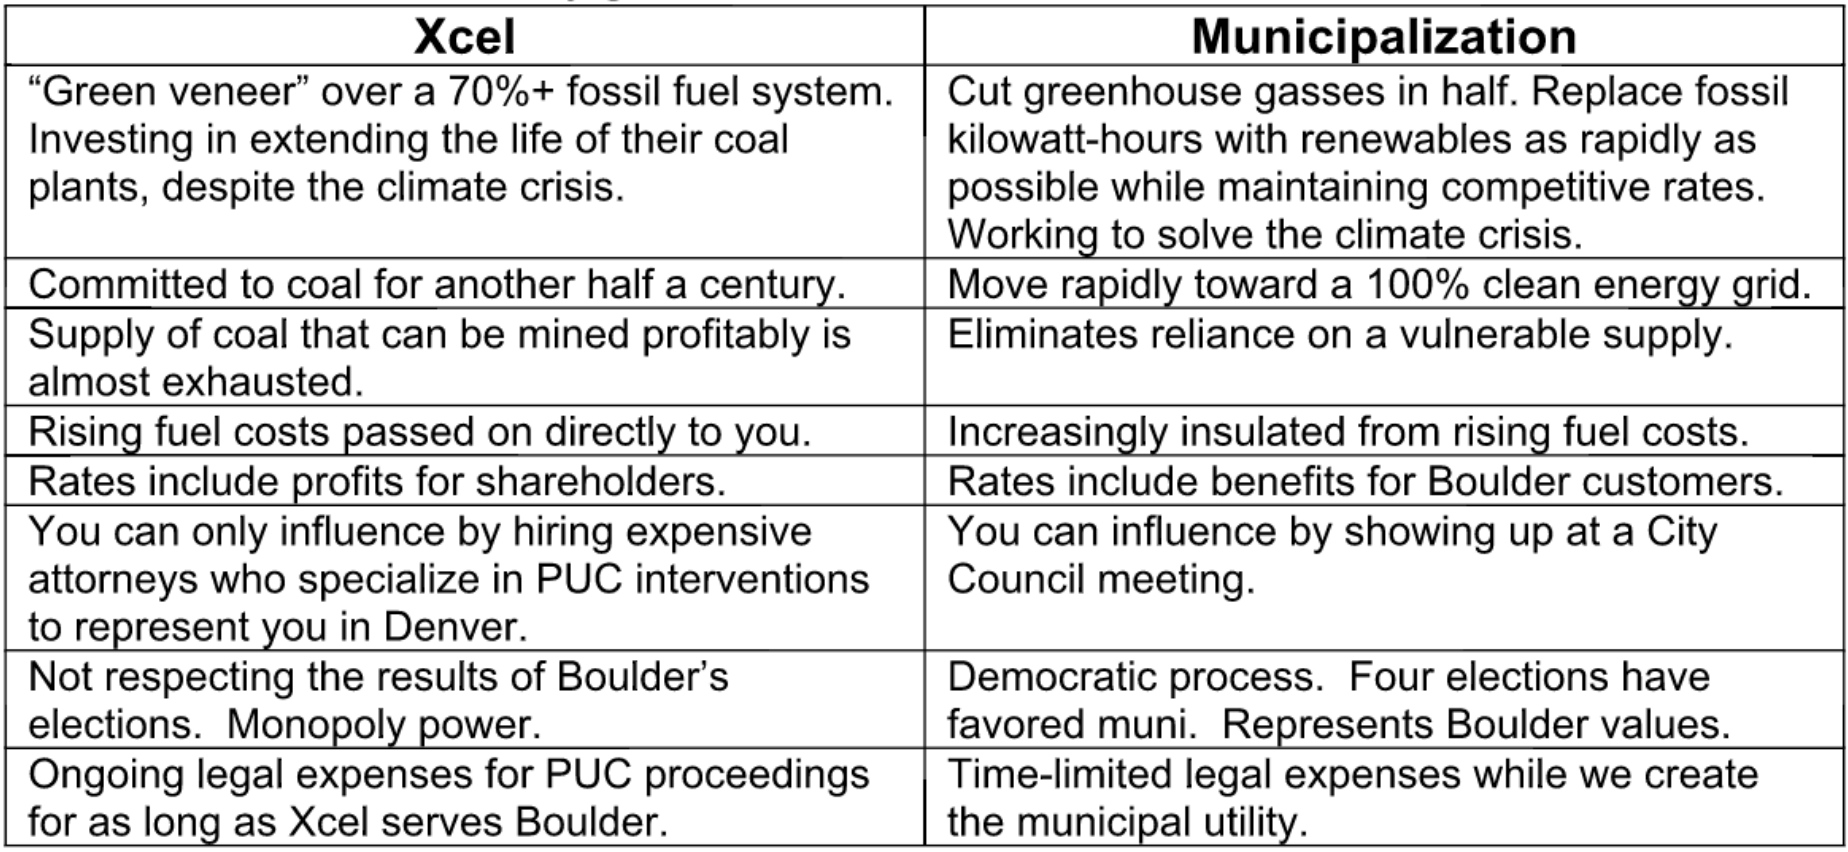 Xcel vs Municipalization